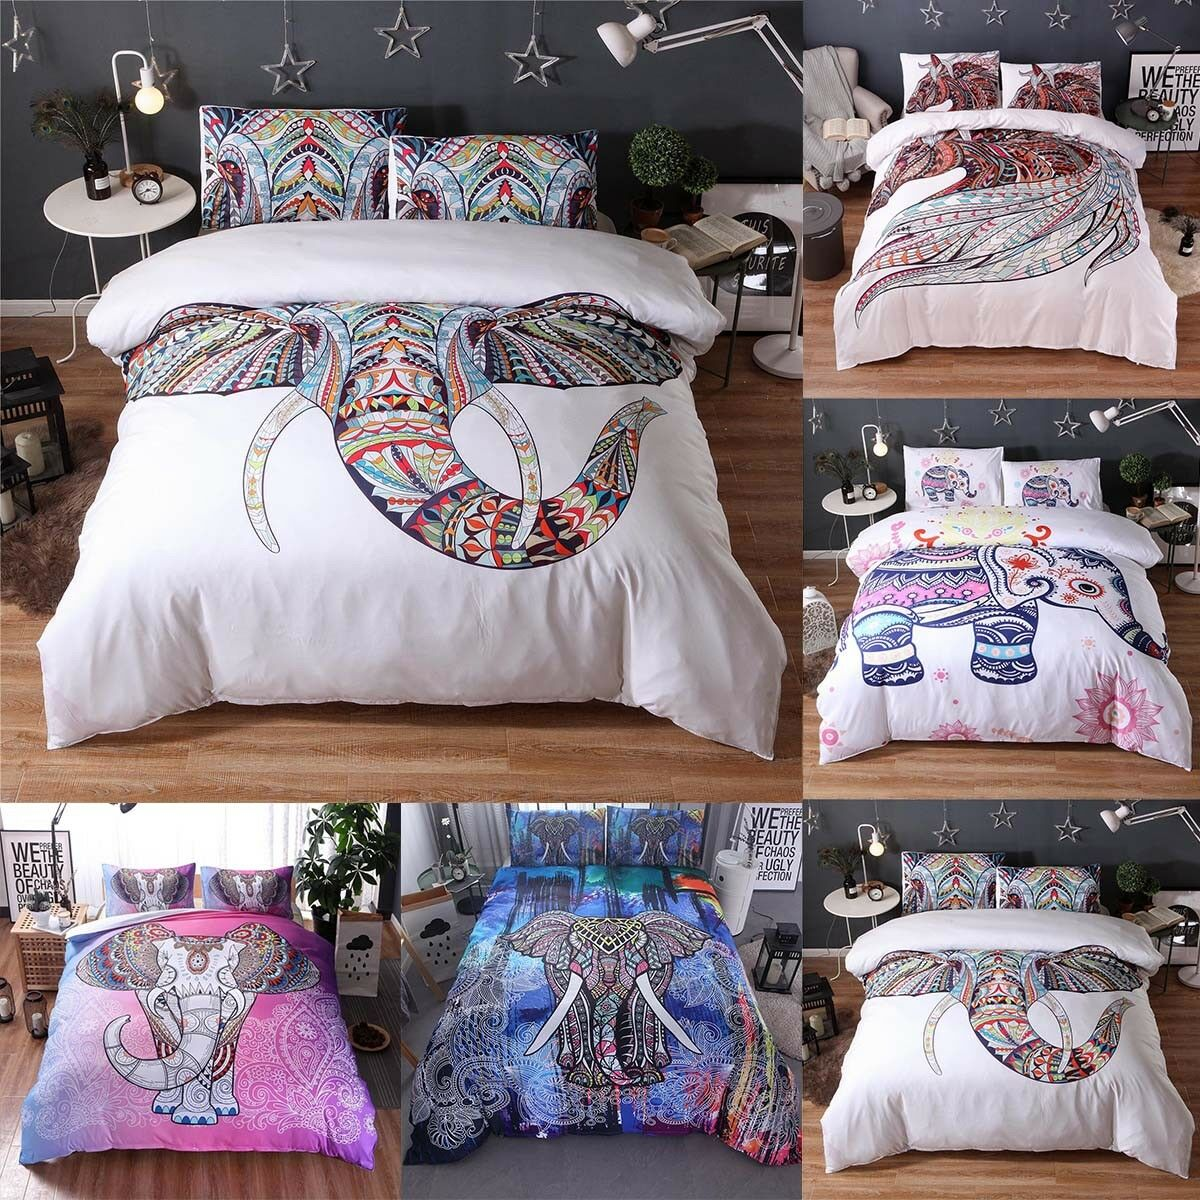 Bedroom Elephant Indian Duvet Doona Cover Boho Quilt Cover Bedding Set Fashion